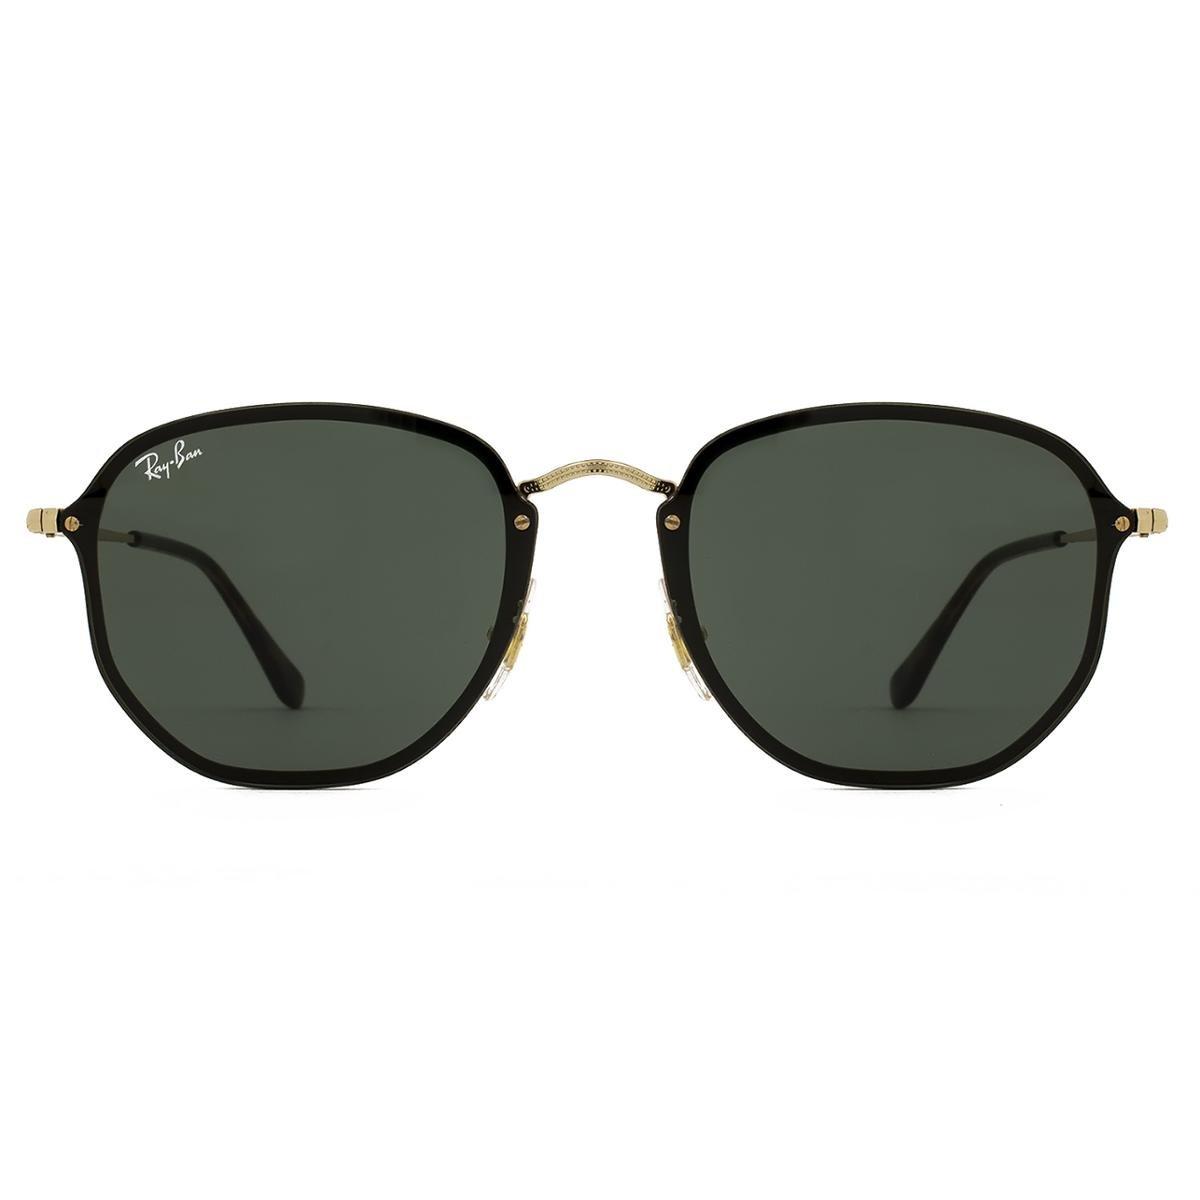 Óculos de Sol Ray Ban Blaze Hexagonal RB3579N 001 71-58 - Compre ... 28c7804b46